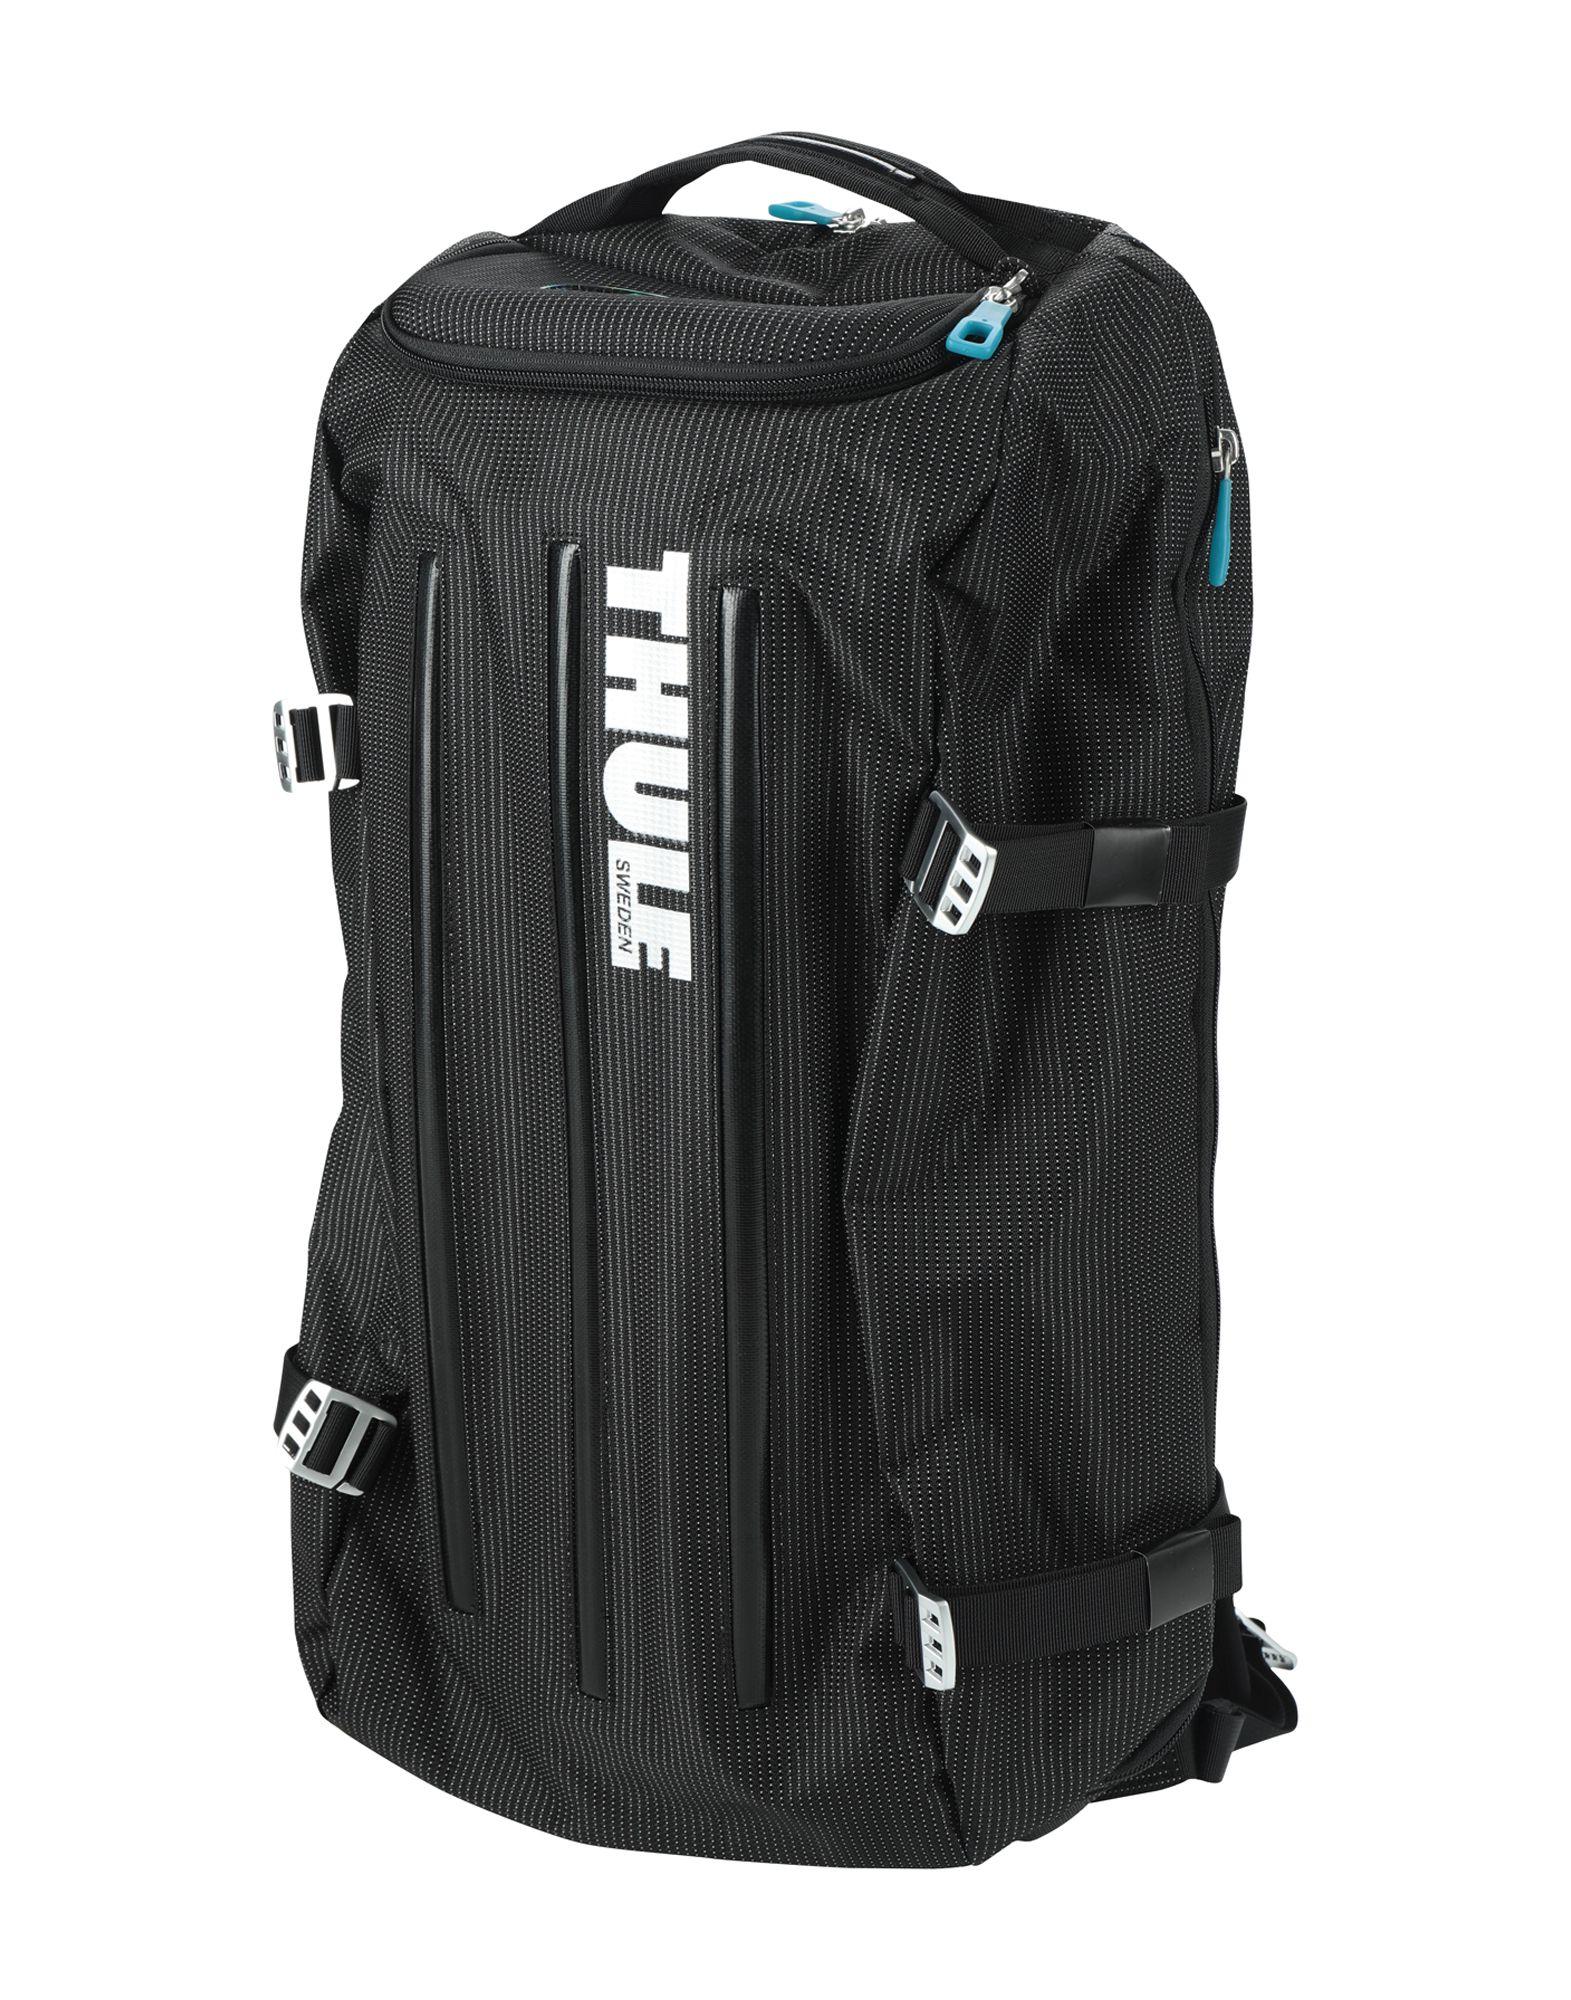 THULE® Рюкзаки и сумки на пояс ноутбук рюкзак 3d пузырь галактики печати рюкзаки большой емкости отдыха сумки